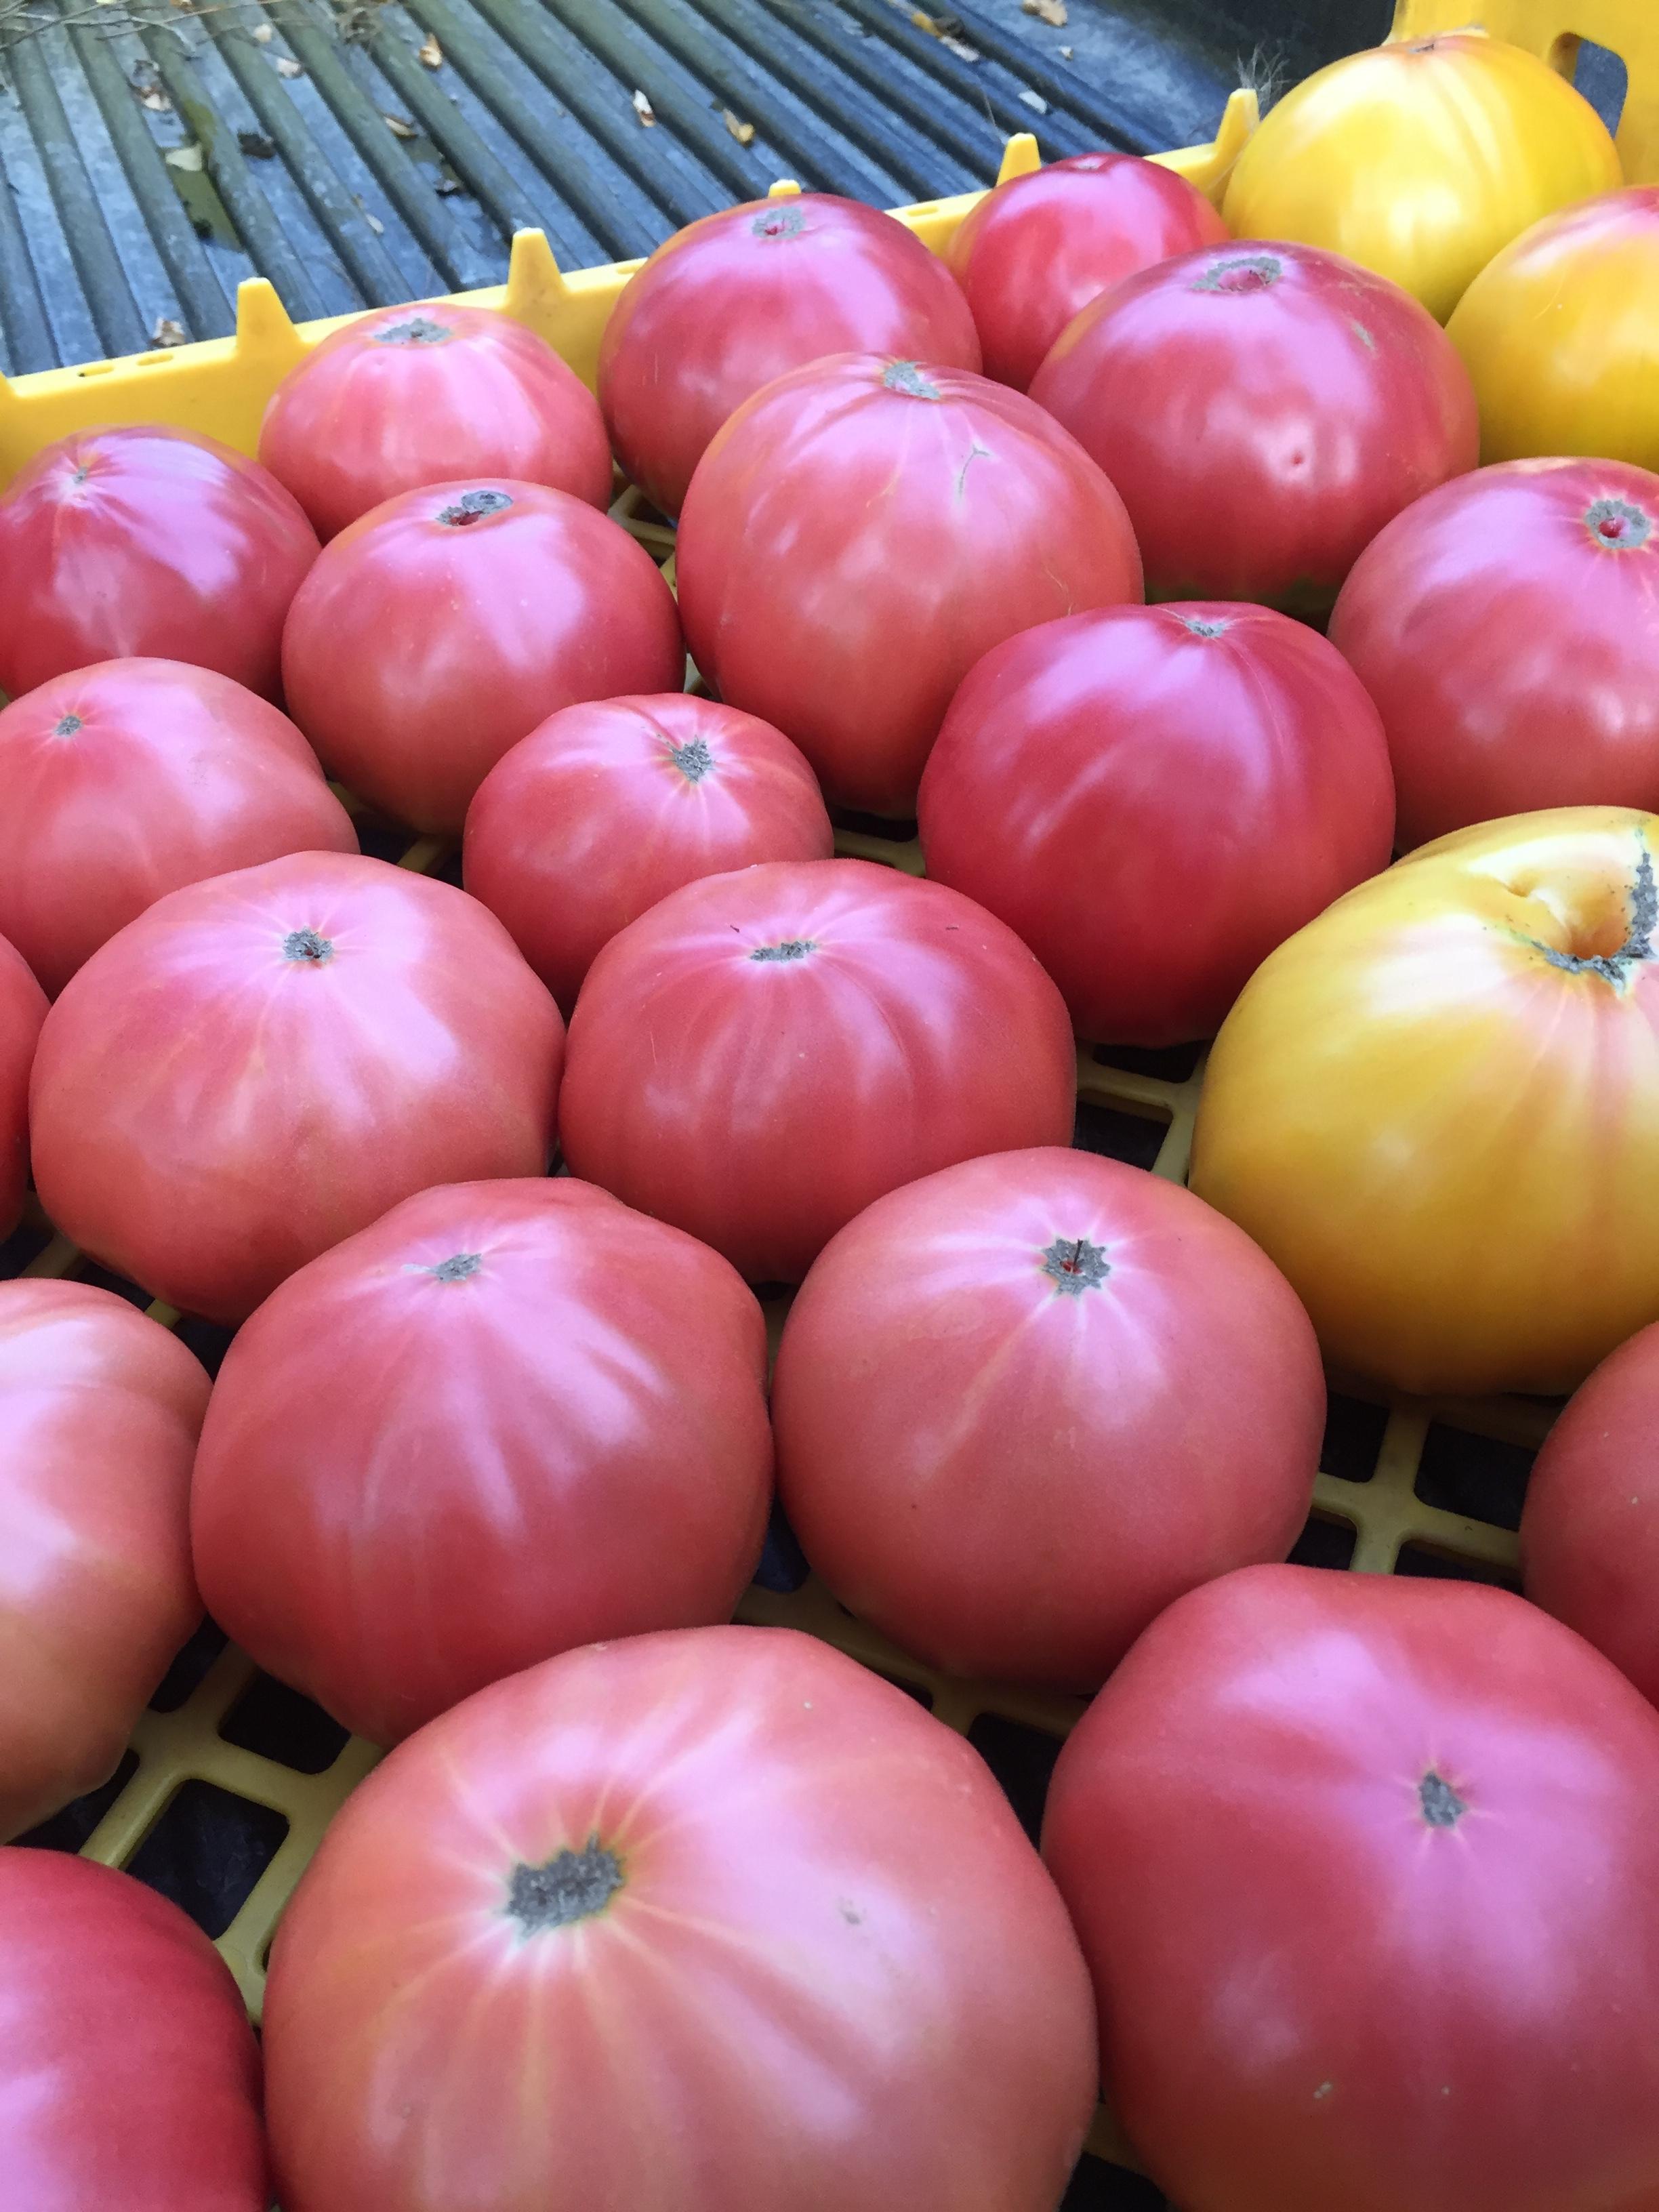 flawless_tomatoes.JPG